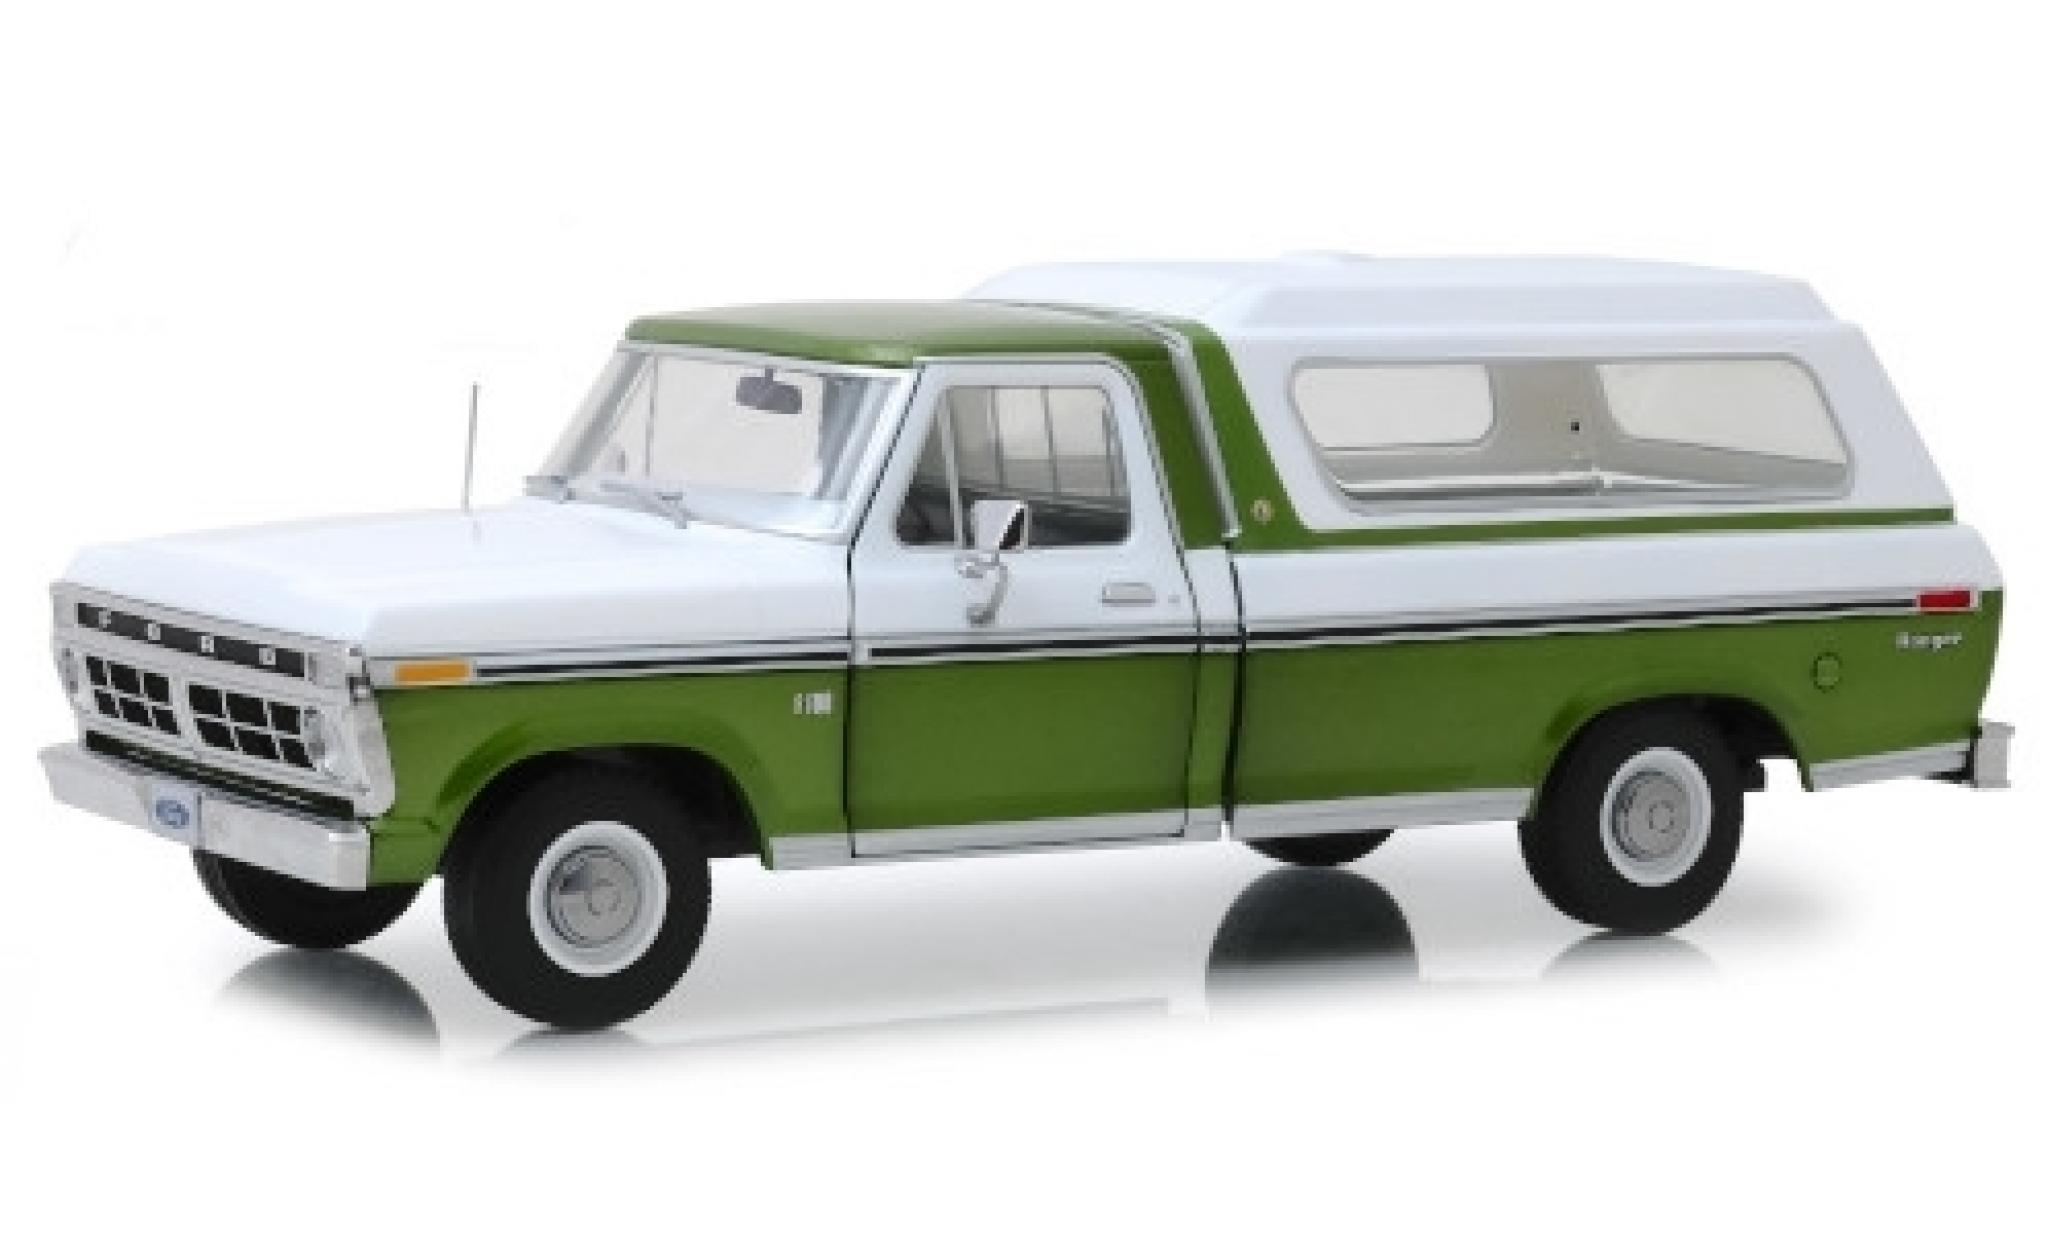 Ford F-1 1/18 Greenlight 00 metallise verte/blanche 1976 avec détachable Ladeabdeckung